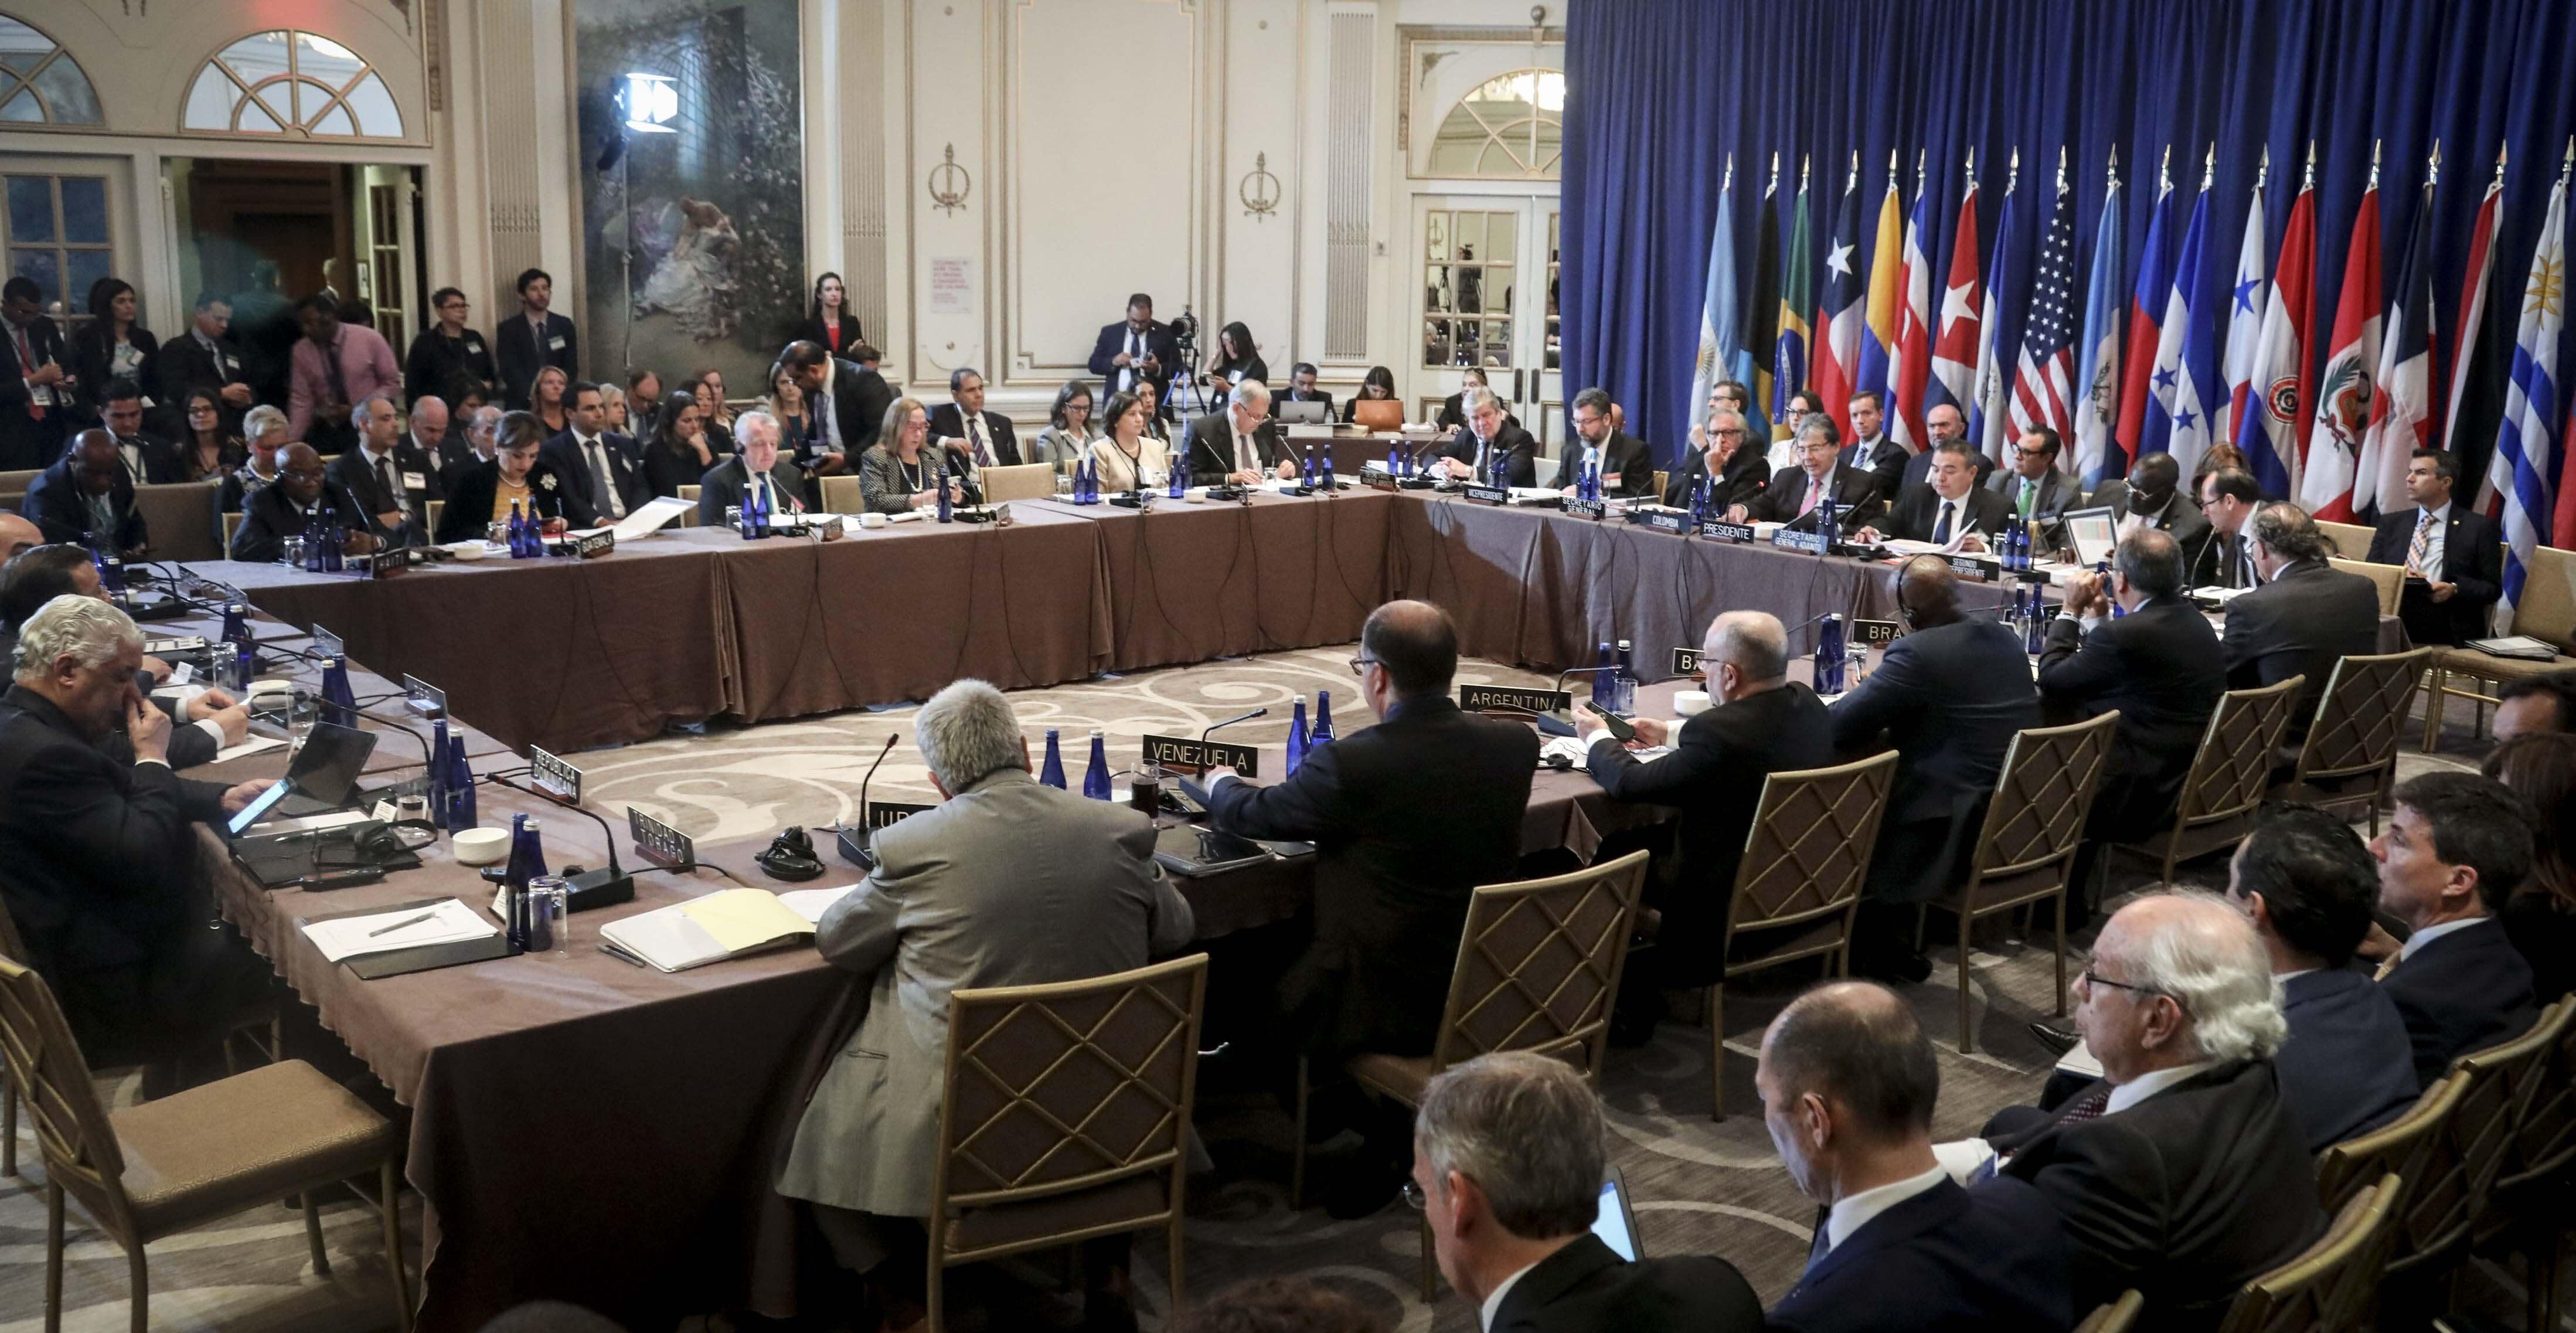 Members of the Rio Treaty organized by the Organization of American States meet to discuss sanctions on Venezuela, Monday Sept. 23, 2019, in New York. (AP Photo/Bebeto Matthews)